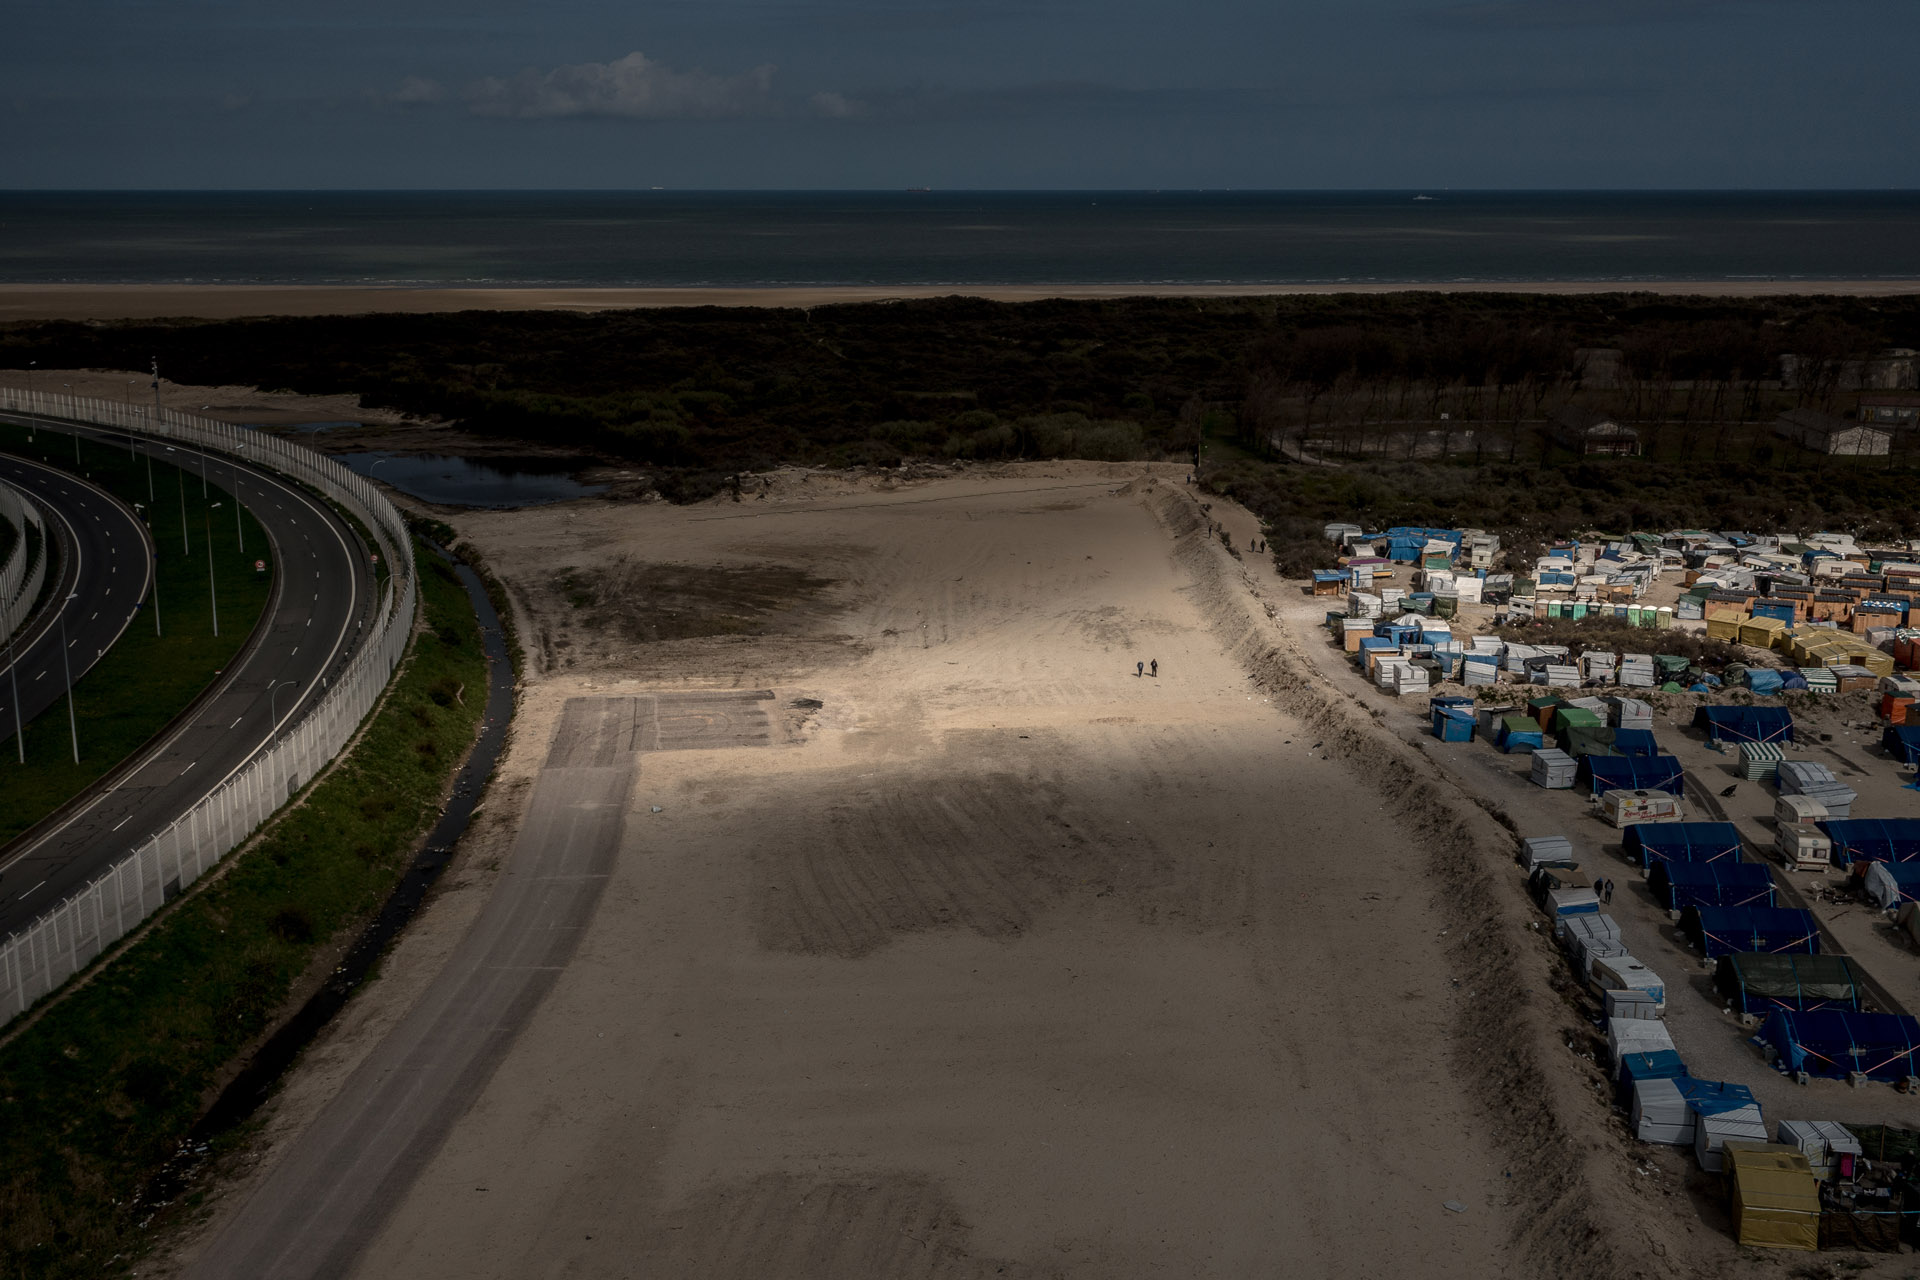 Migrants walk in the bufferzone in Calais.